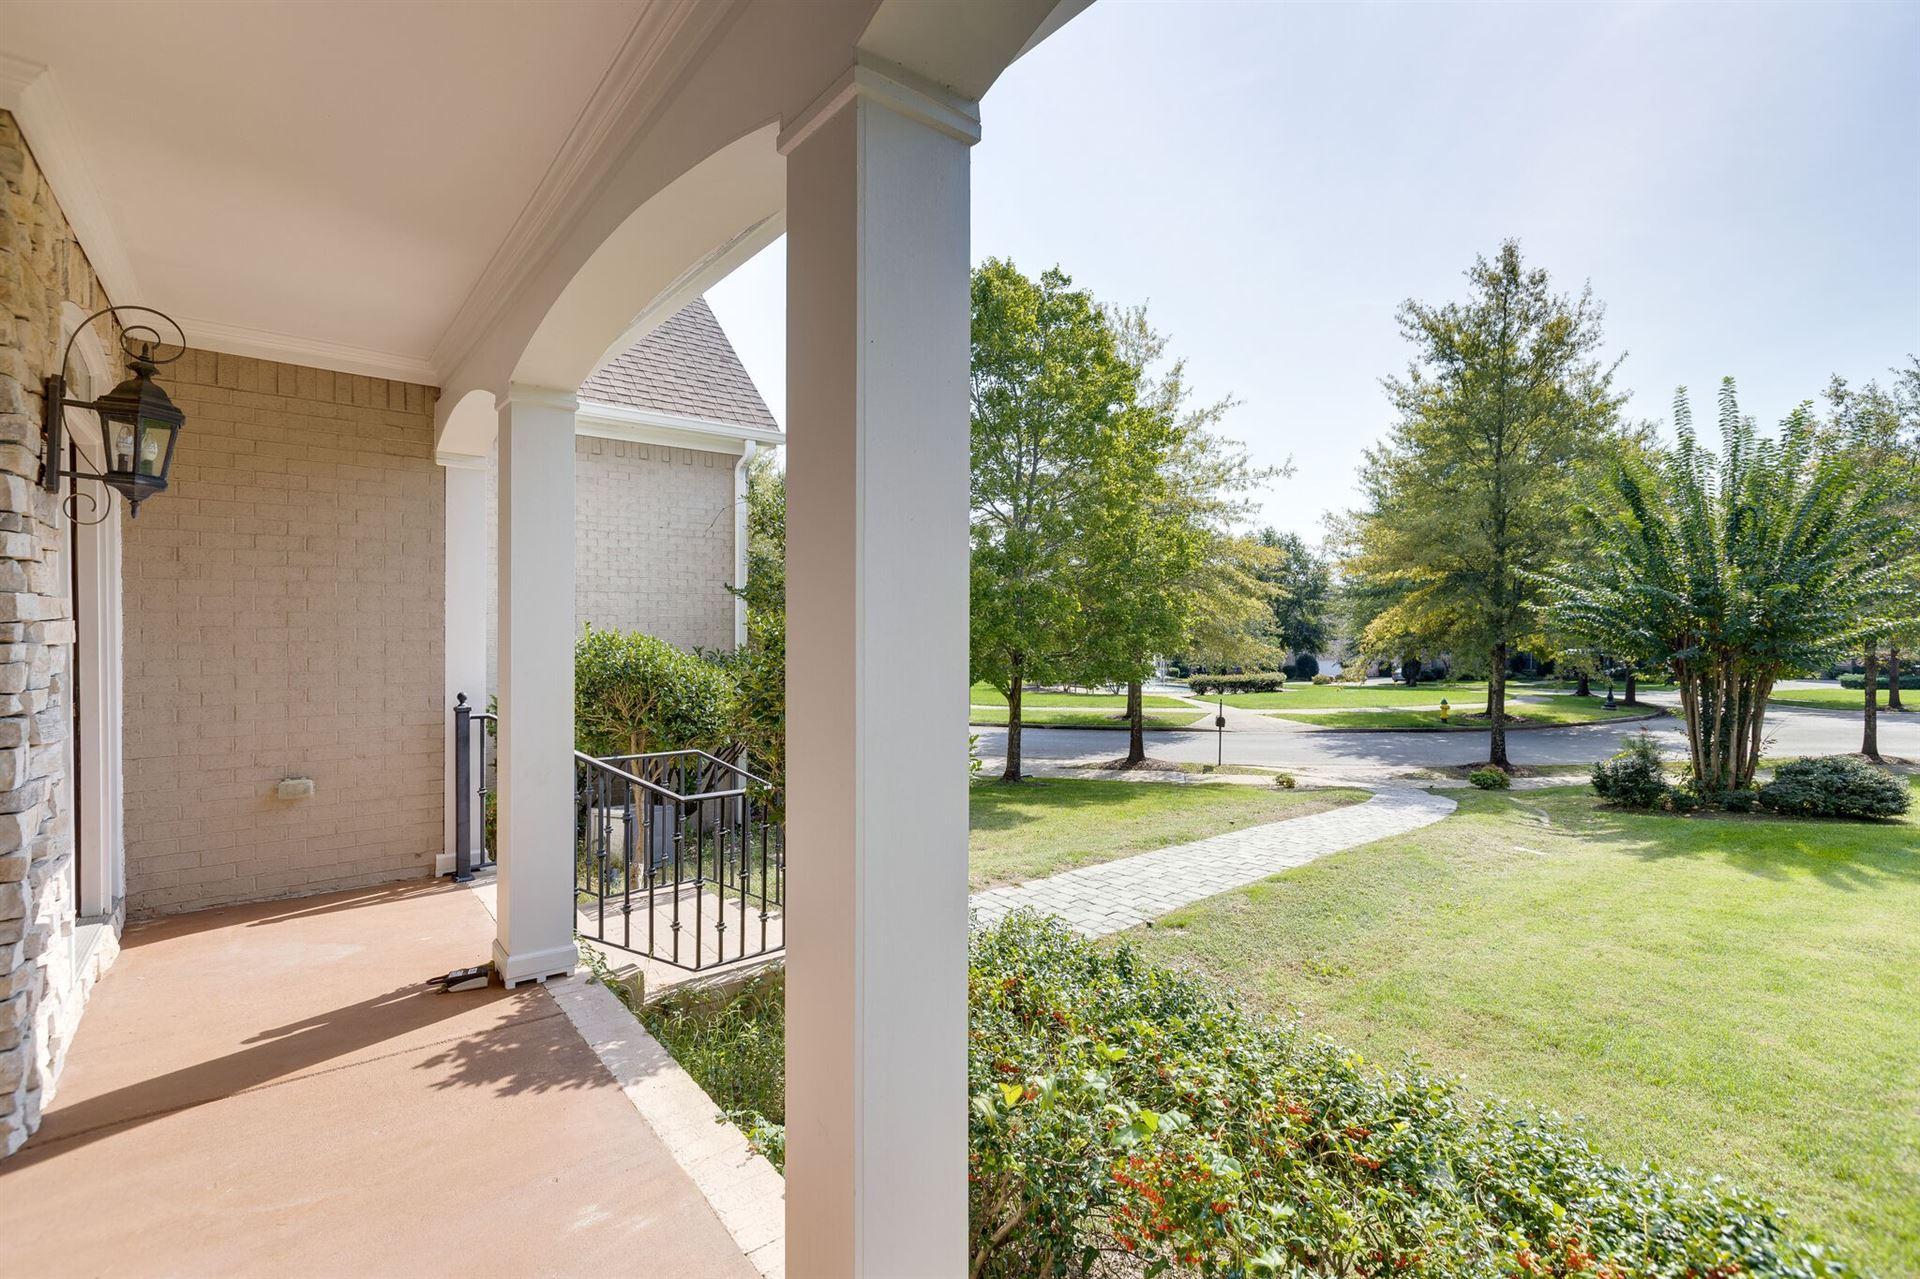 Photo of 165 Cornerstone Cir, Franklin, TN 37064 (MLS # 2300140)